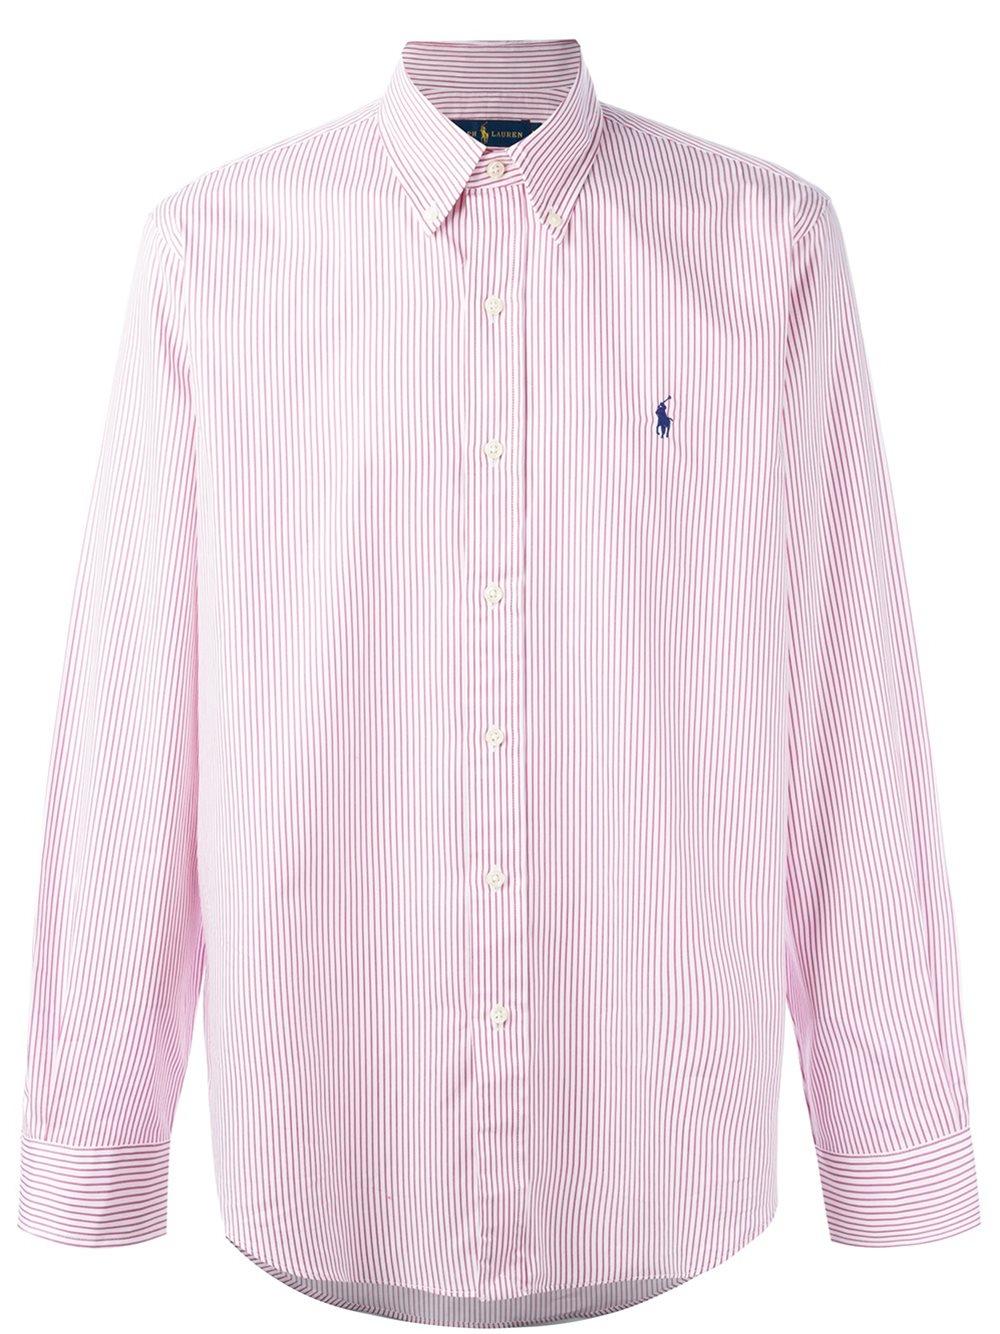 Lyst polo ralph lauren striped button down shirt in for Striped button down shirts for men